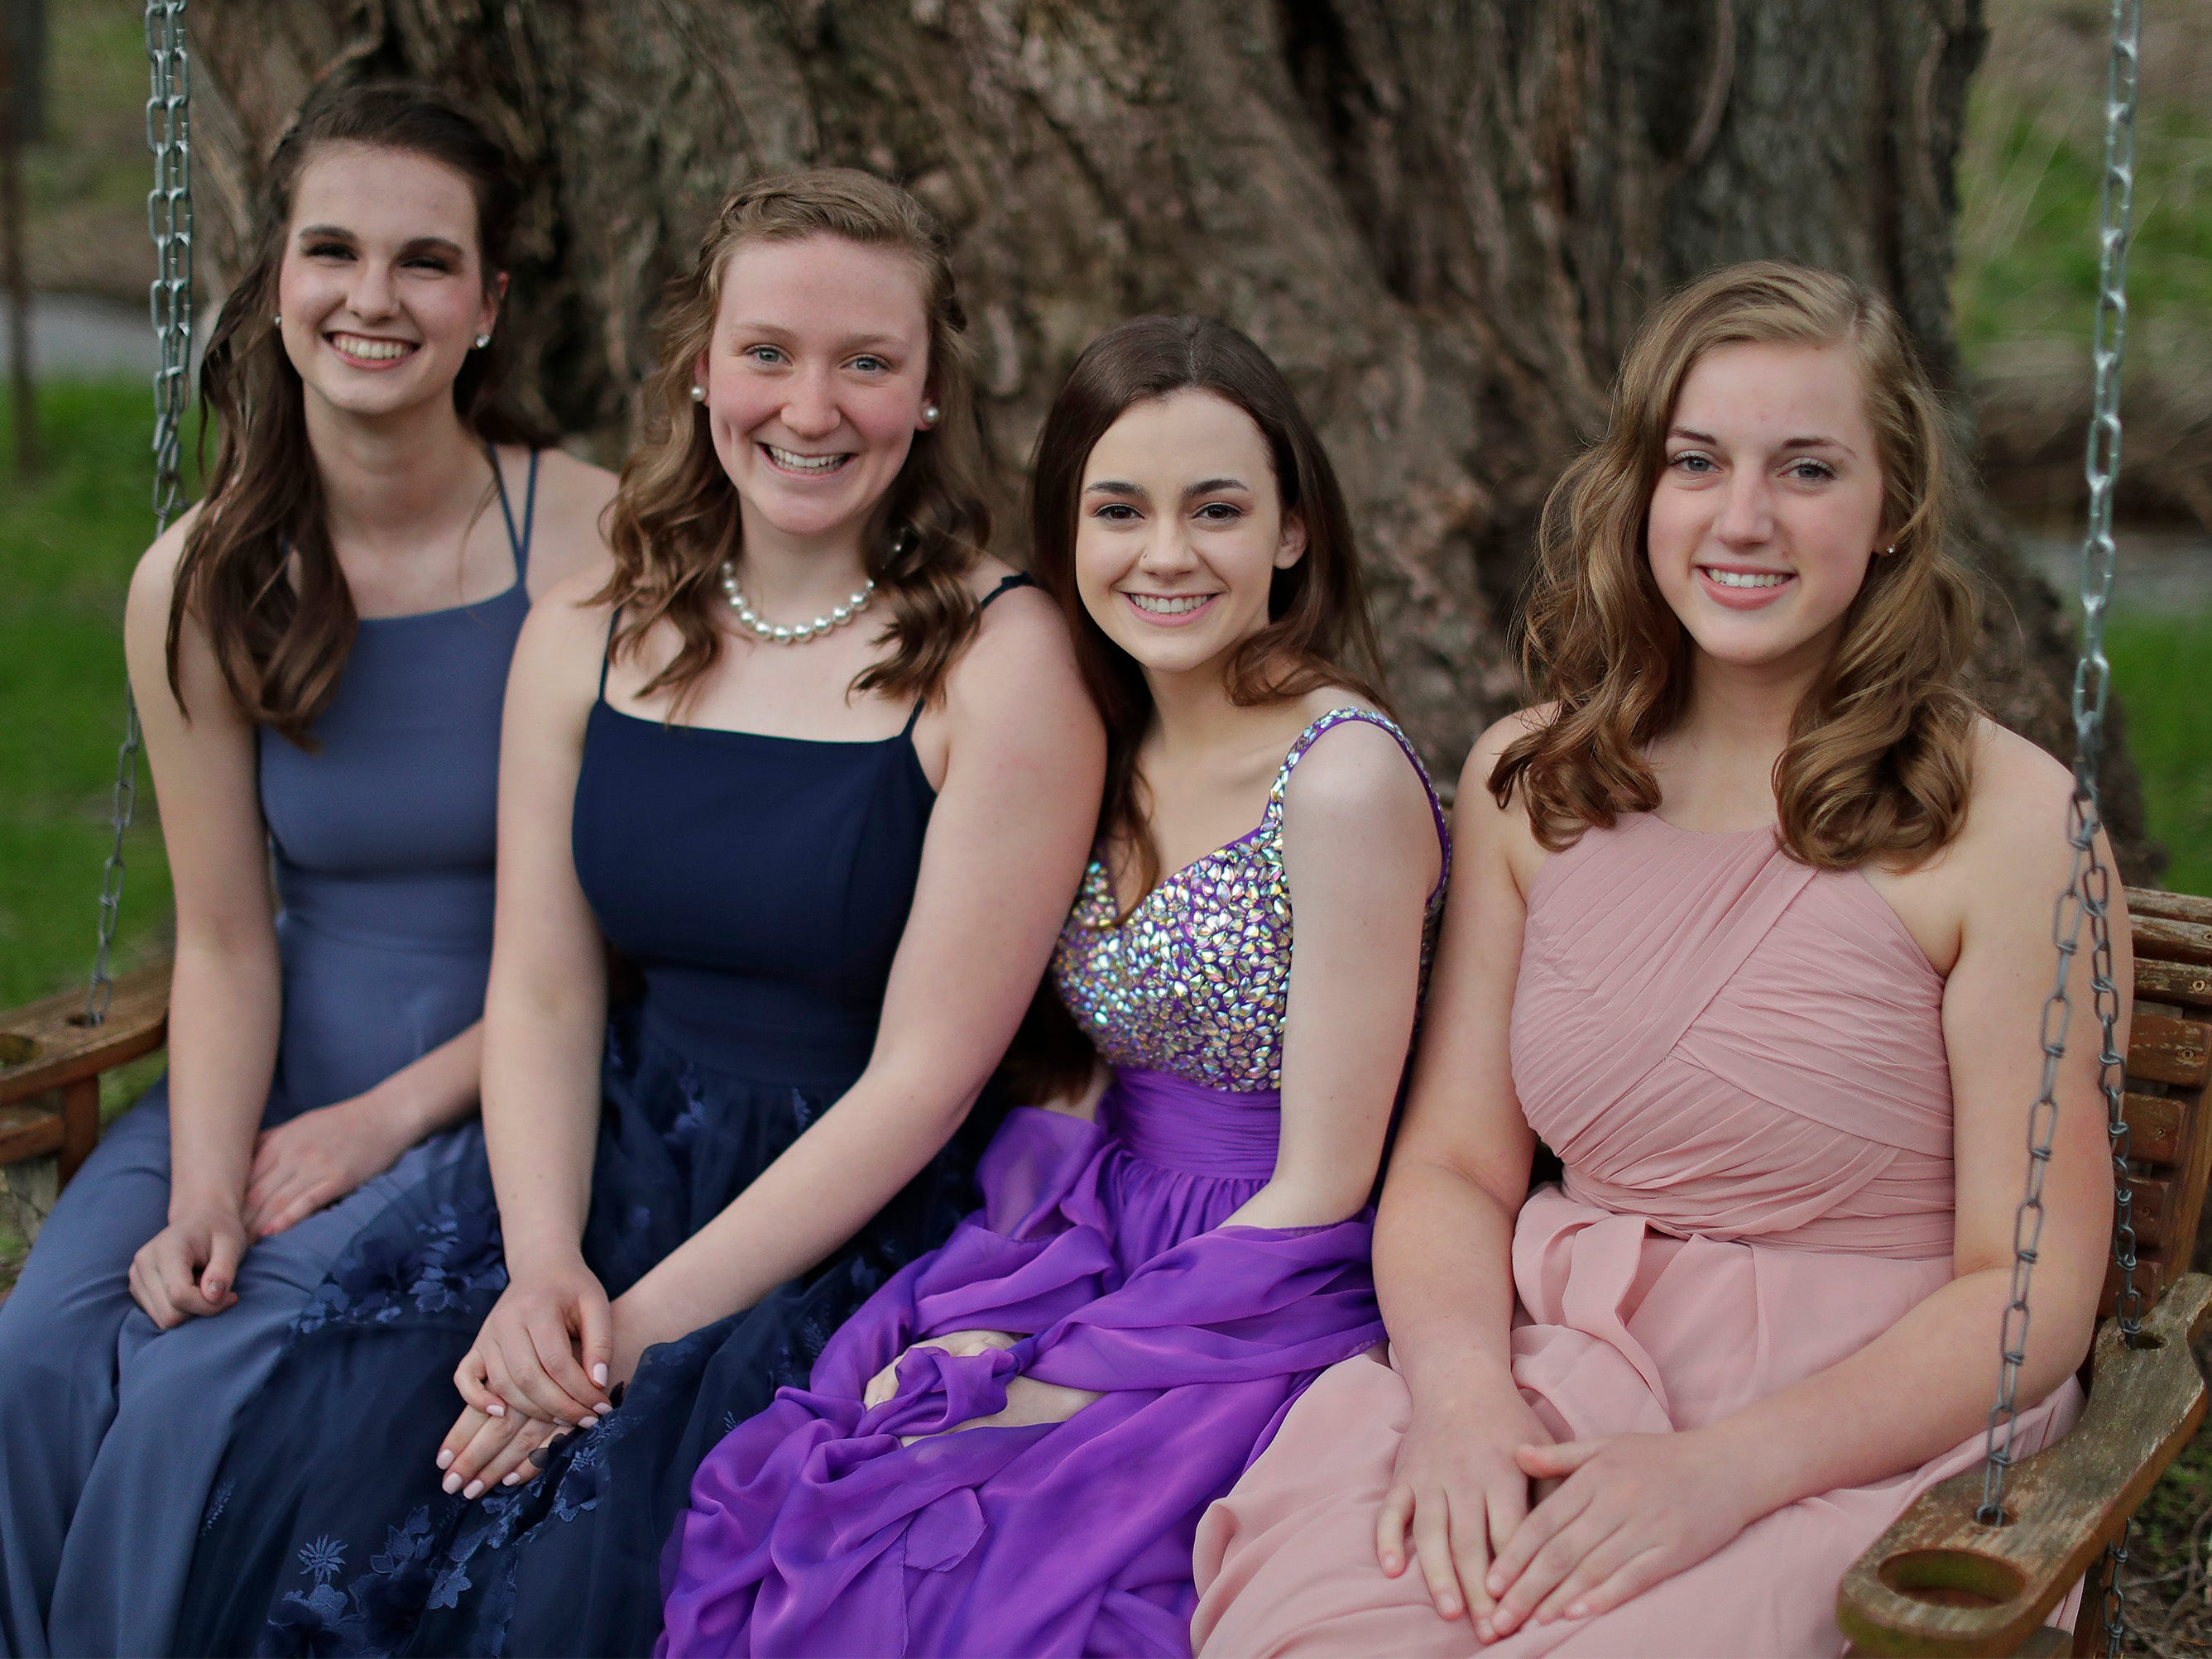 From Left: Isabelle Rahn, Ellie Steenwyk, Annie Cornette and Olivia Heimen pose at the Sheboygan Christian Junior-Senior Banquet, Friday, May 3, 2019, at The Blind Horse, in Kohler, Wis.